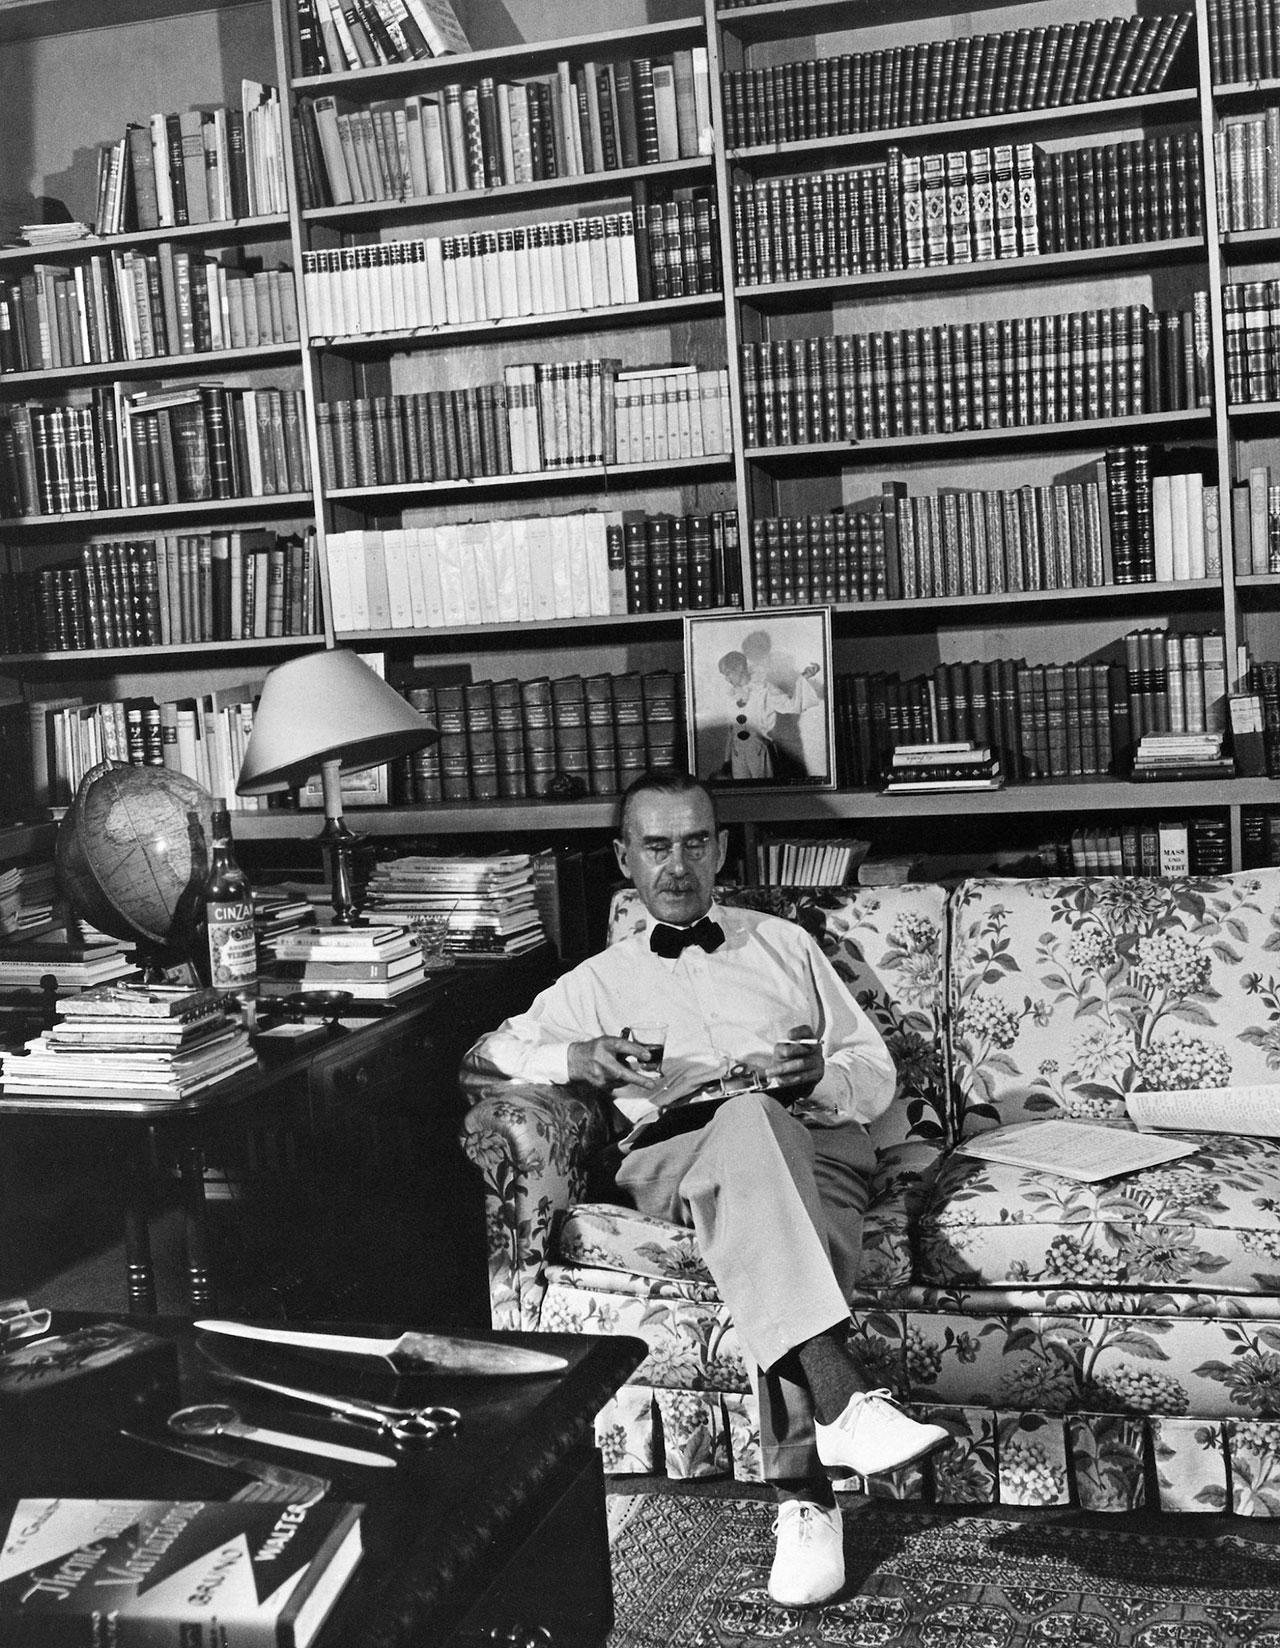 Thomas-Mann-Bookshelf